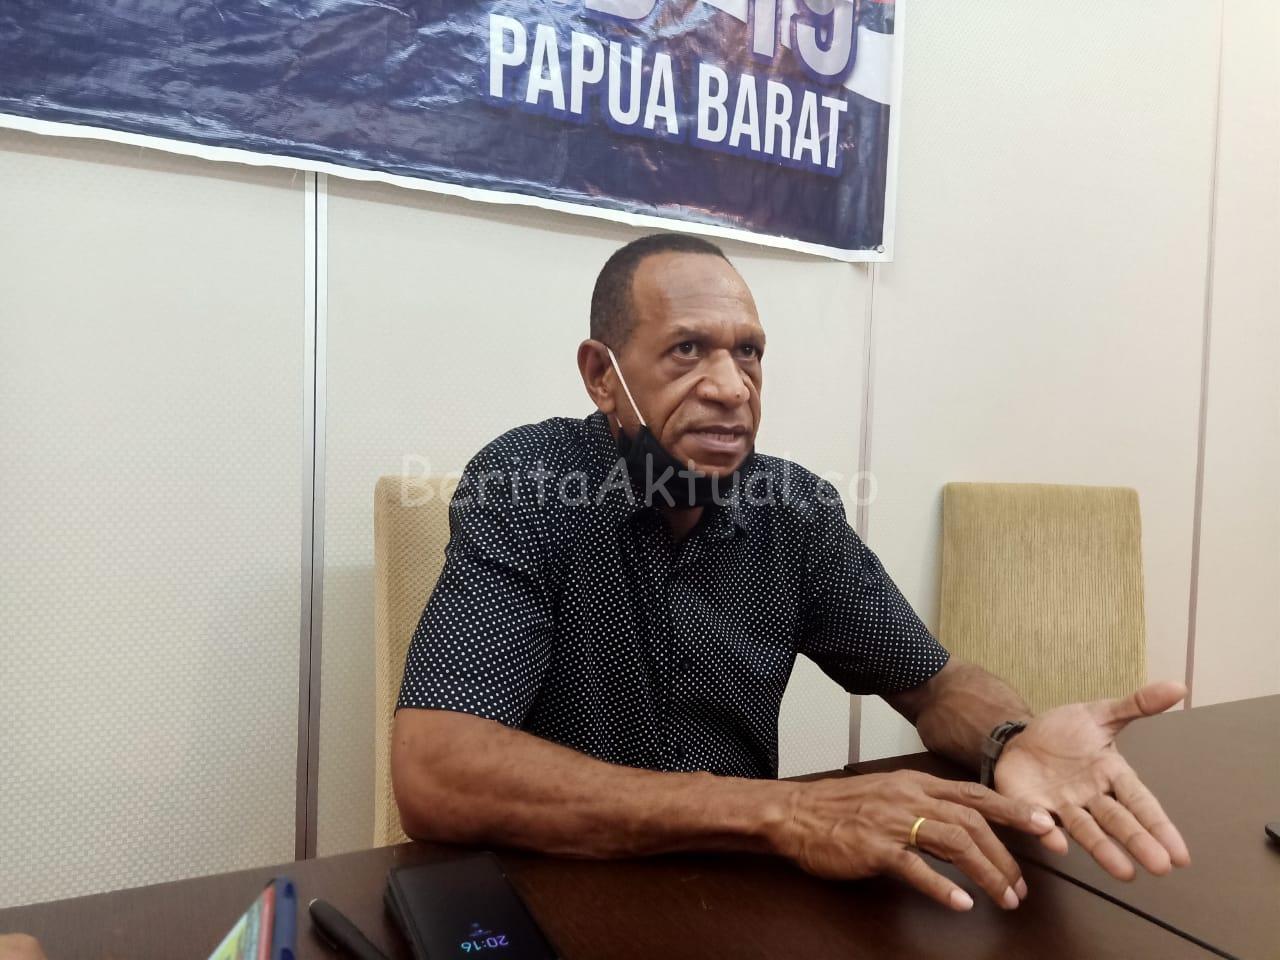 Tambah 5 Orang Positif Dari Bintuni, Kini Papua Barat Jumlah 42 26 IMG 20200501 WA0065